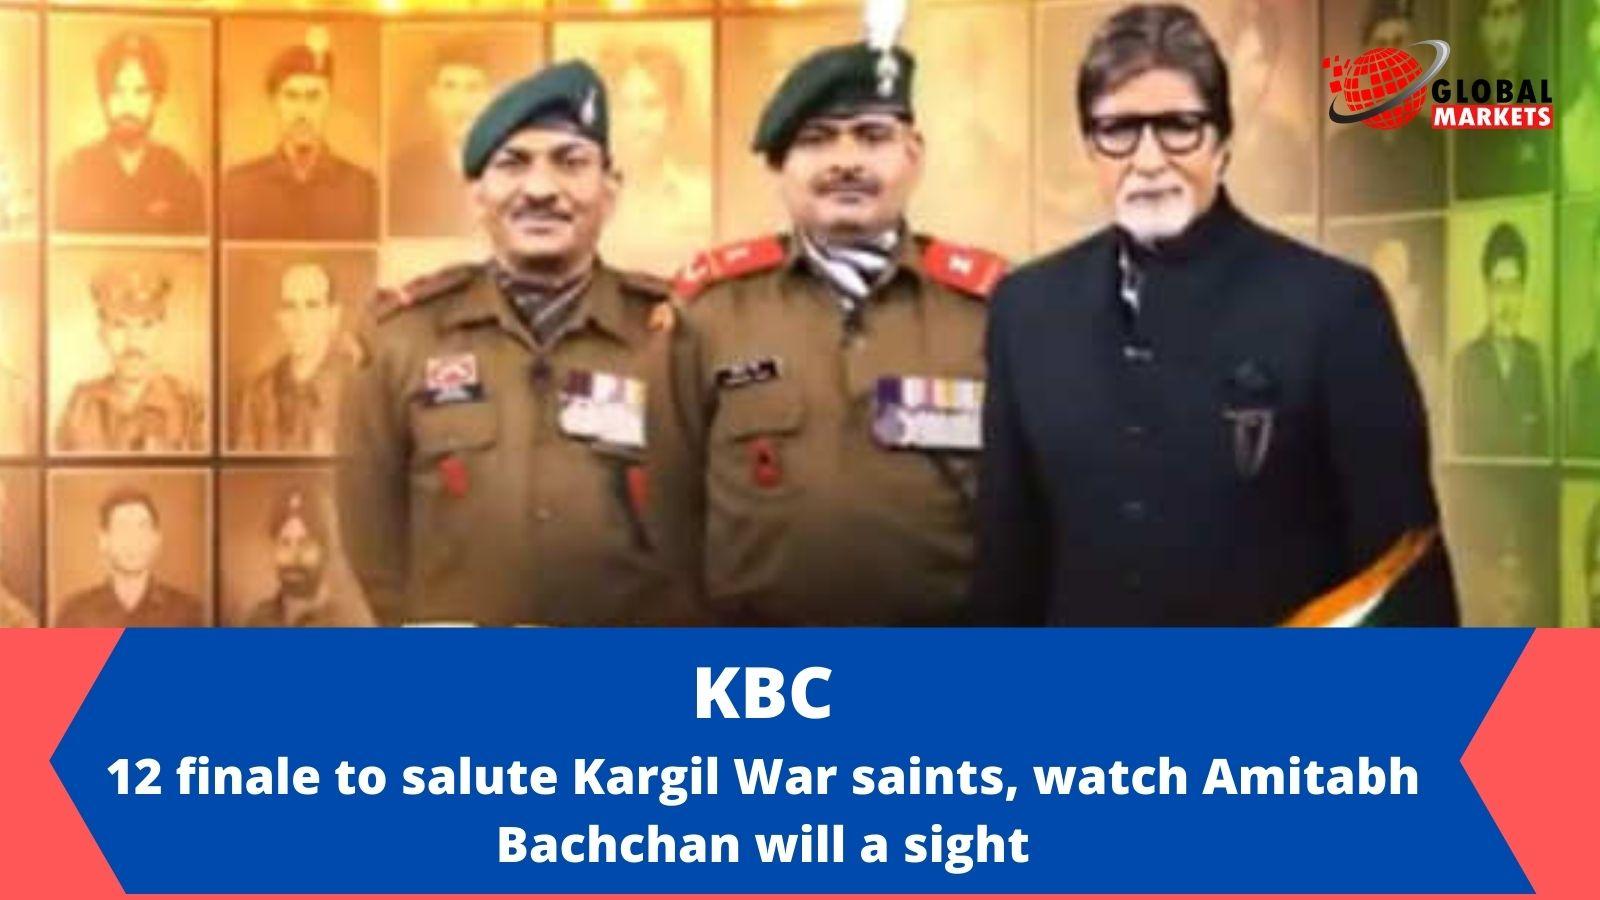 KBC 12 finale to salute Kargil War saints, watch Amitabh Bachchan will a sight.